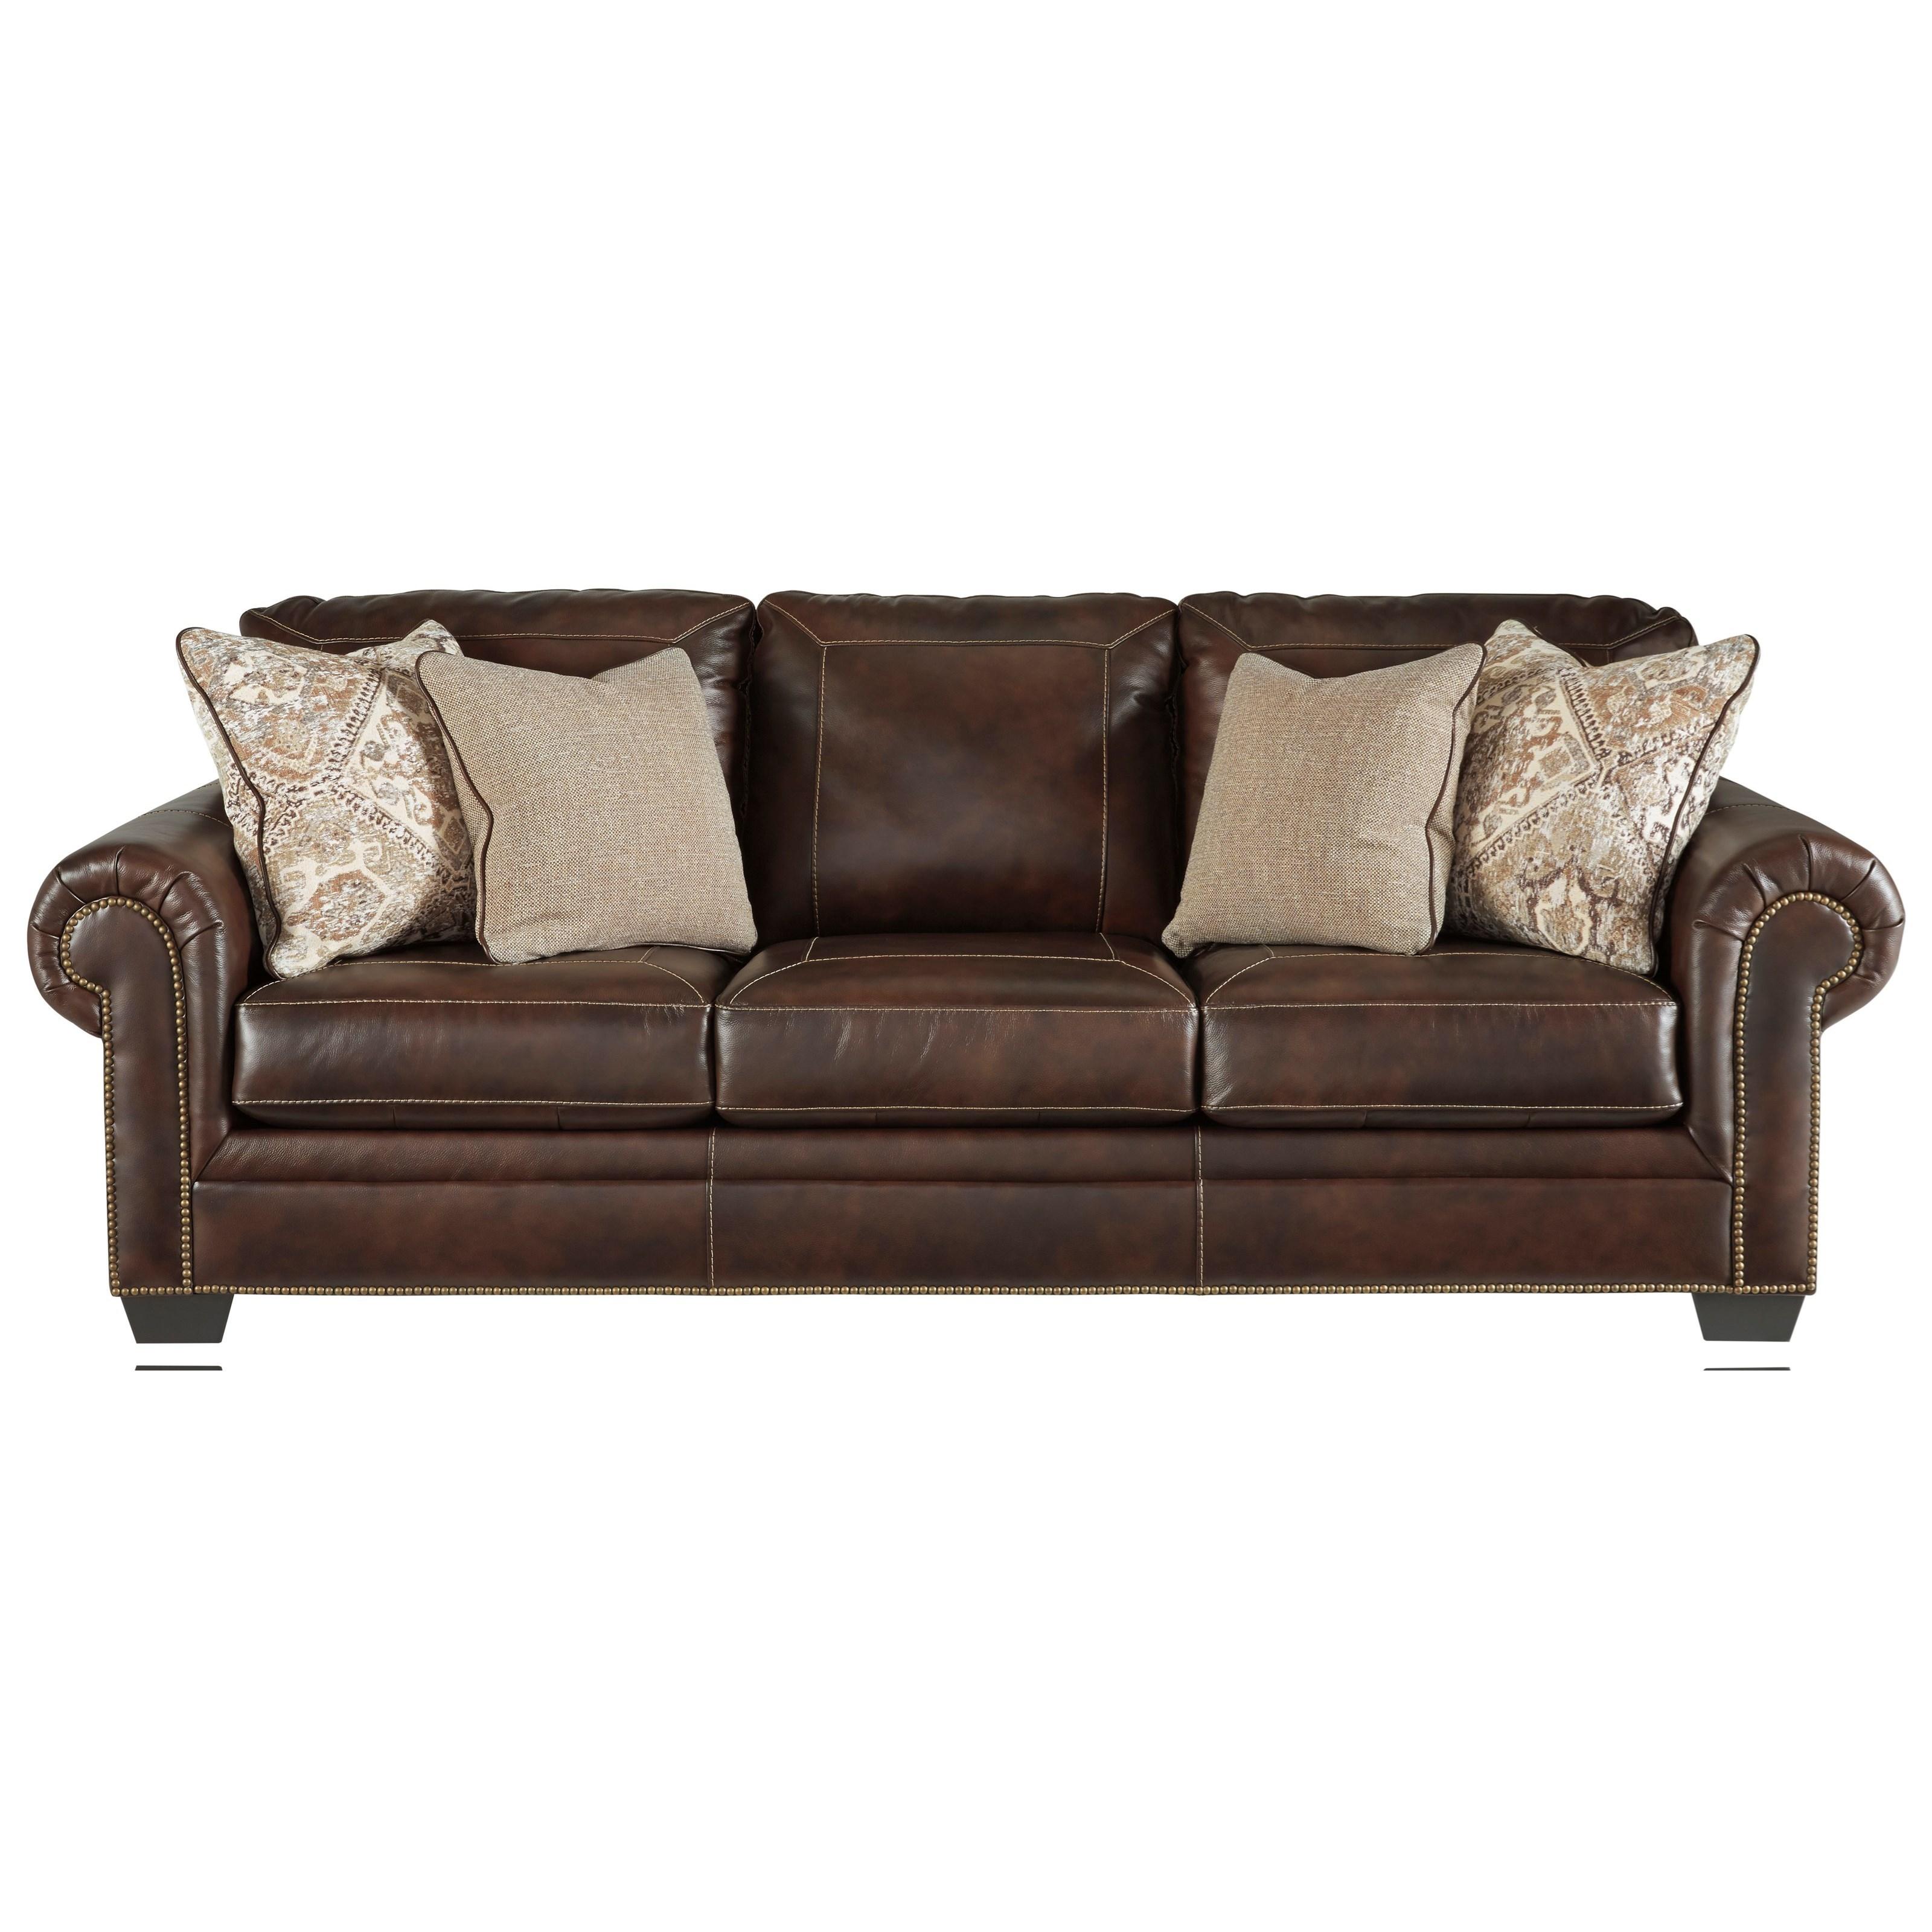 Ashley Signature Design Roleson Transitional Queen Sofa